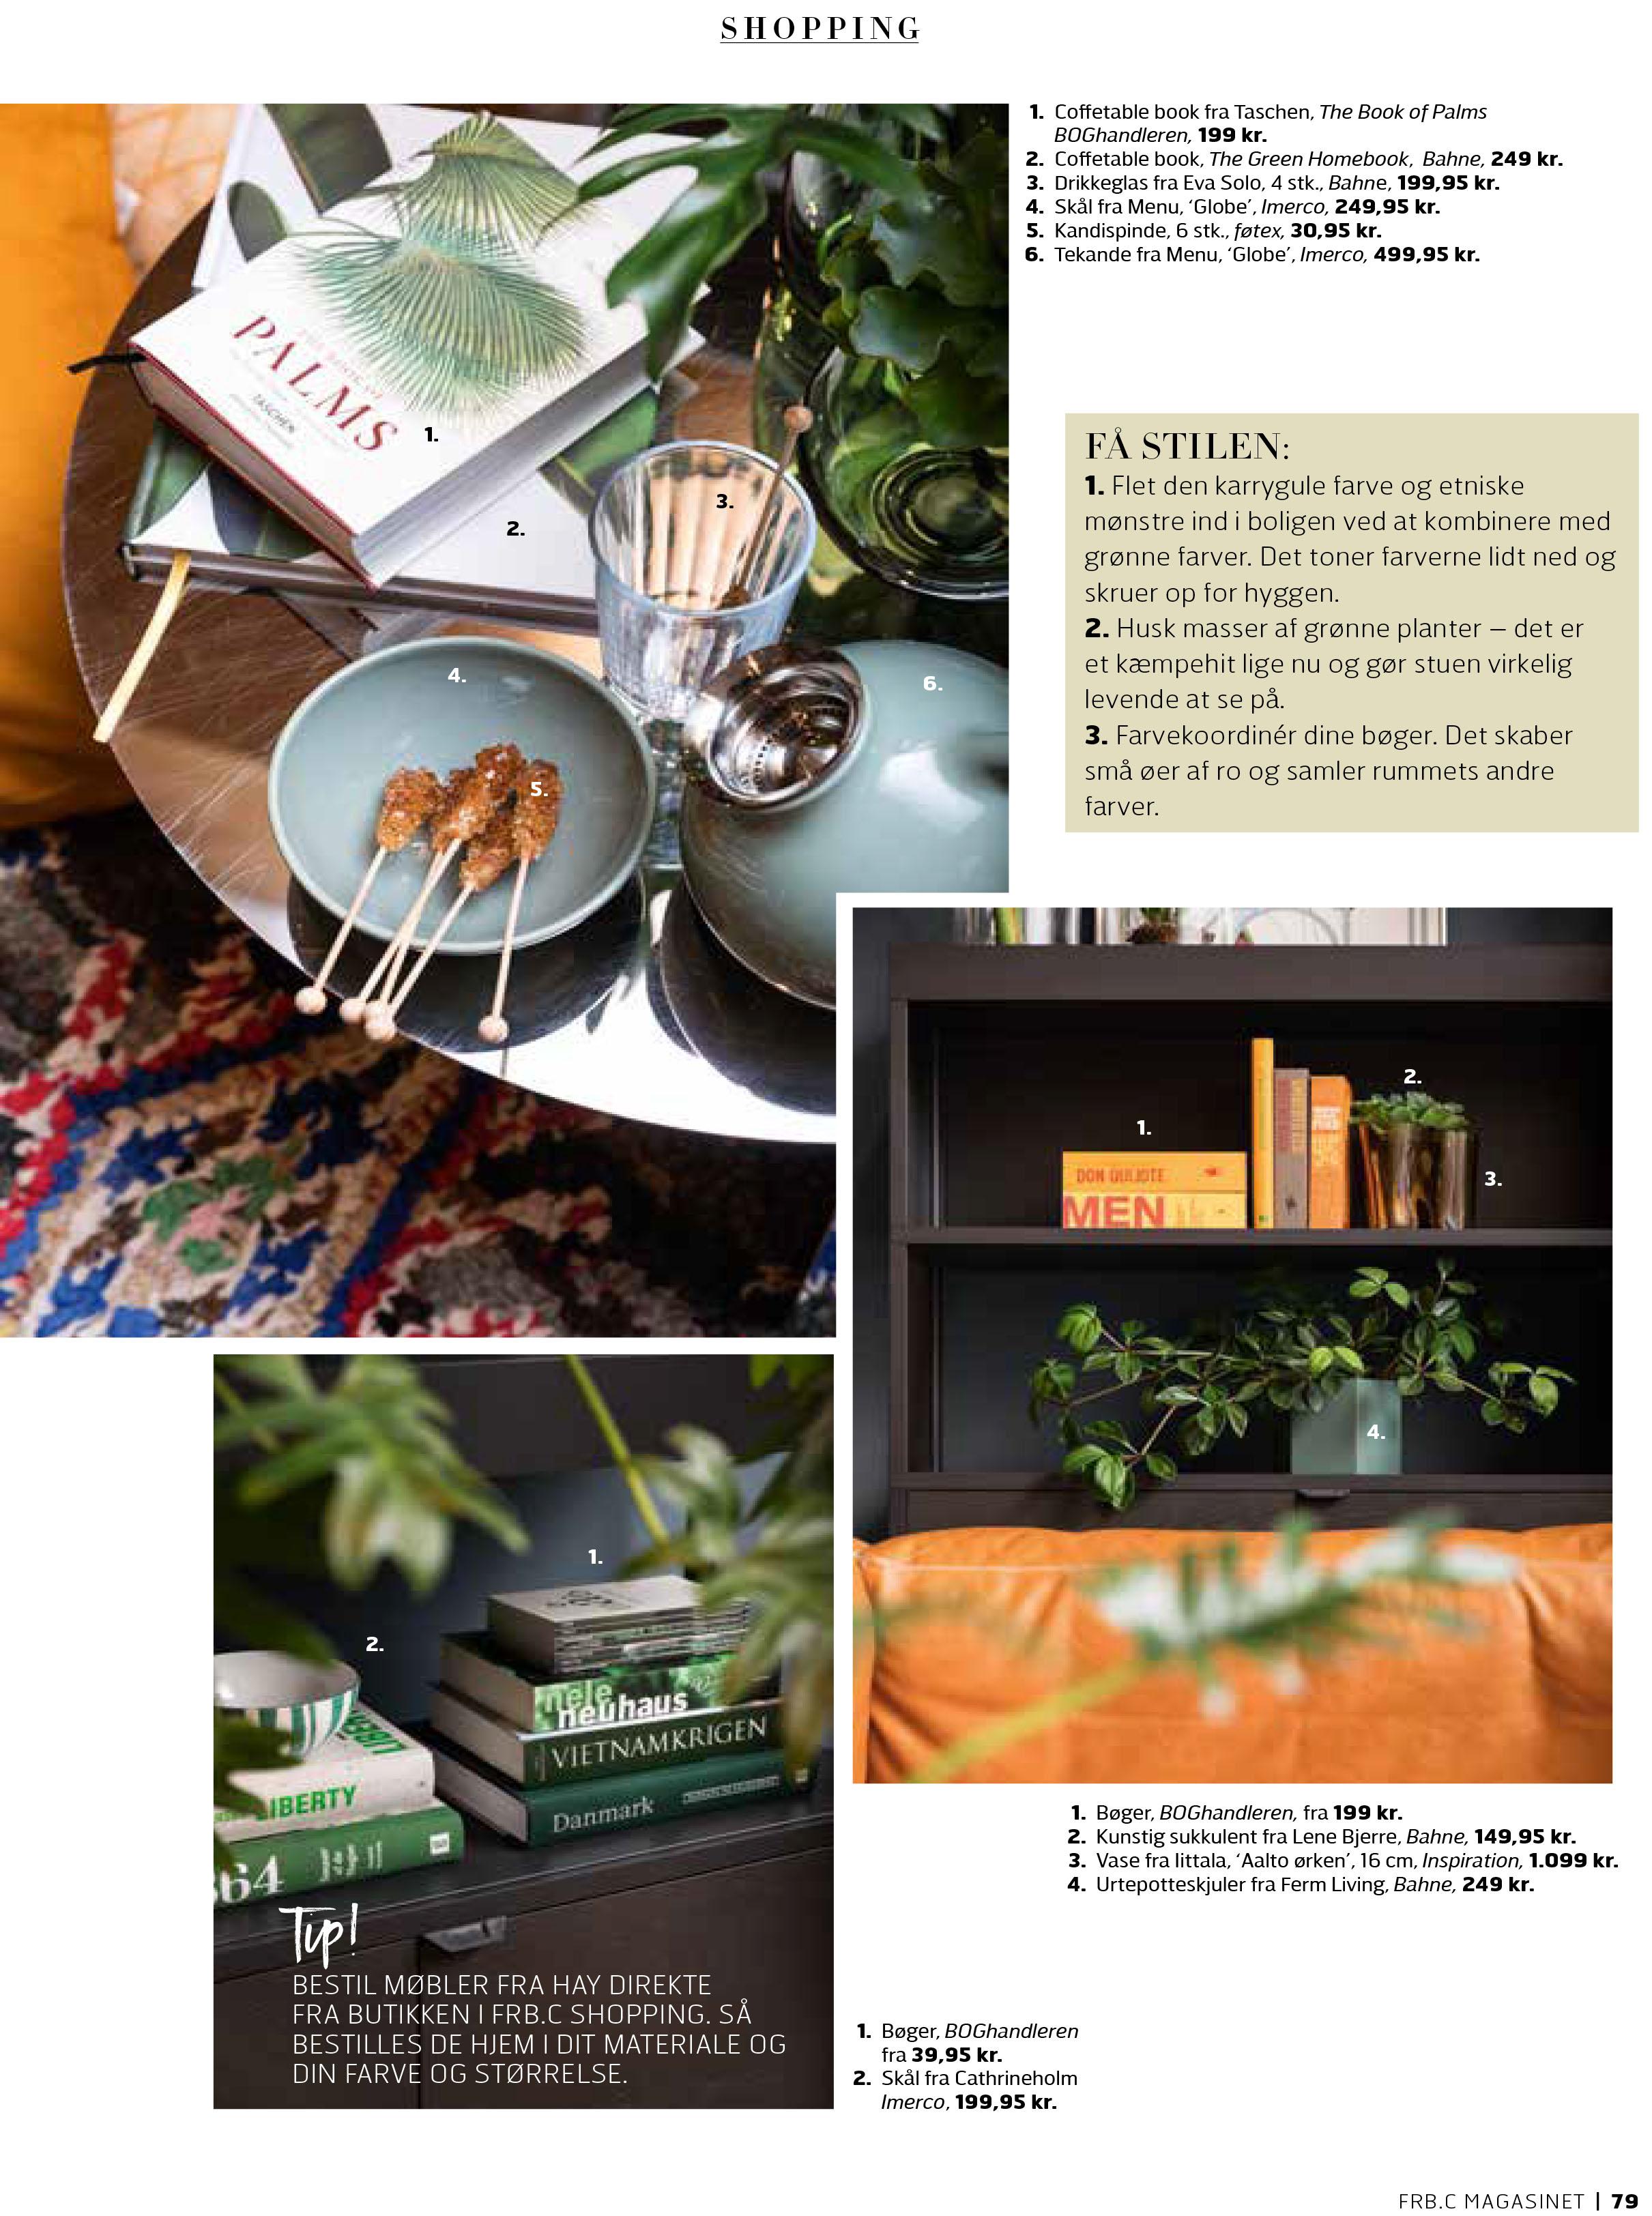 FRB C. magazine Outum ´17 Design Nest CPH